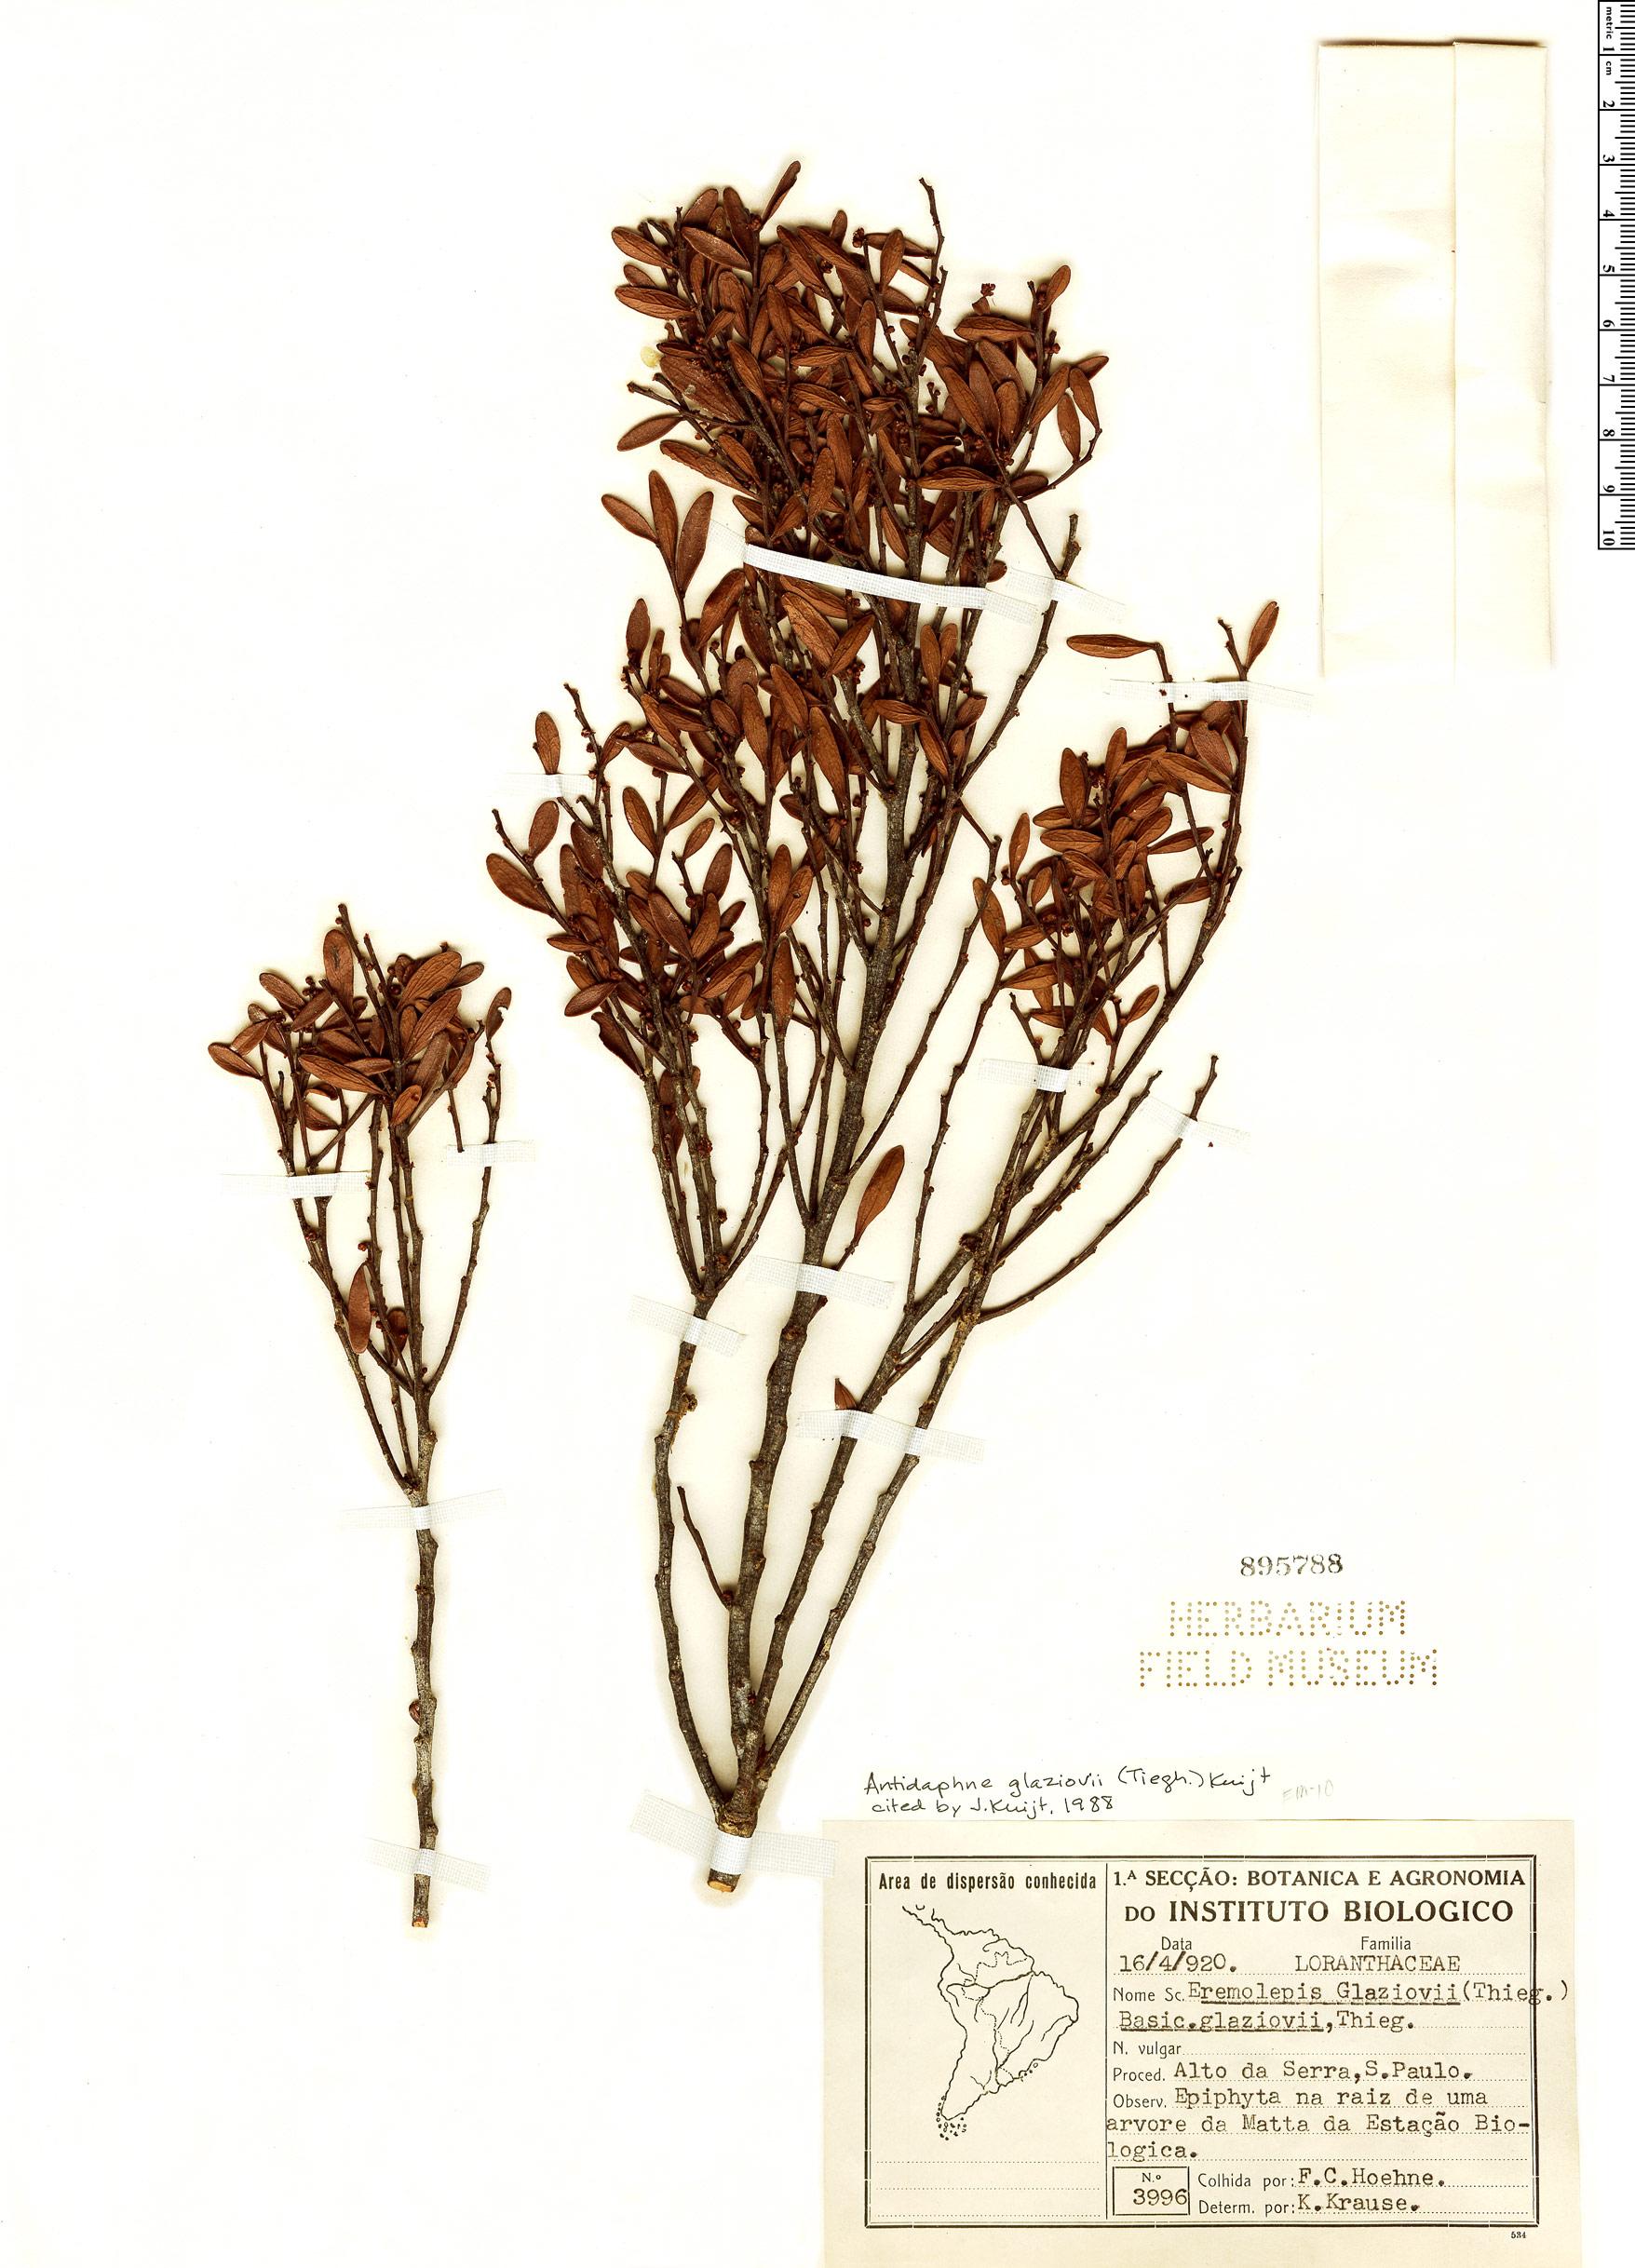 Specimen: Antidaphne glaziovii